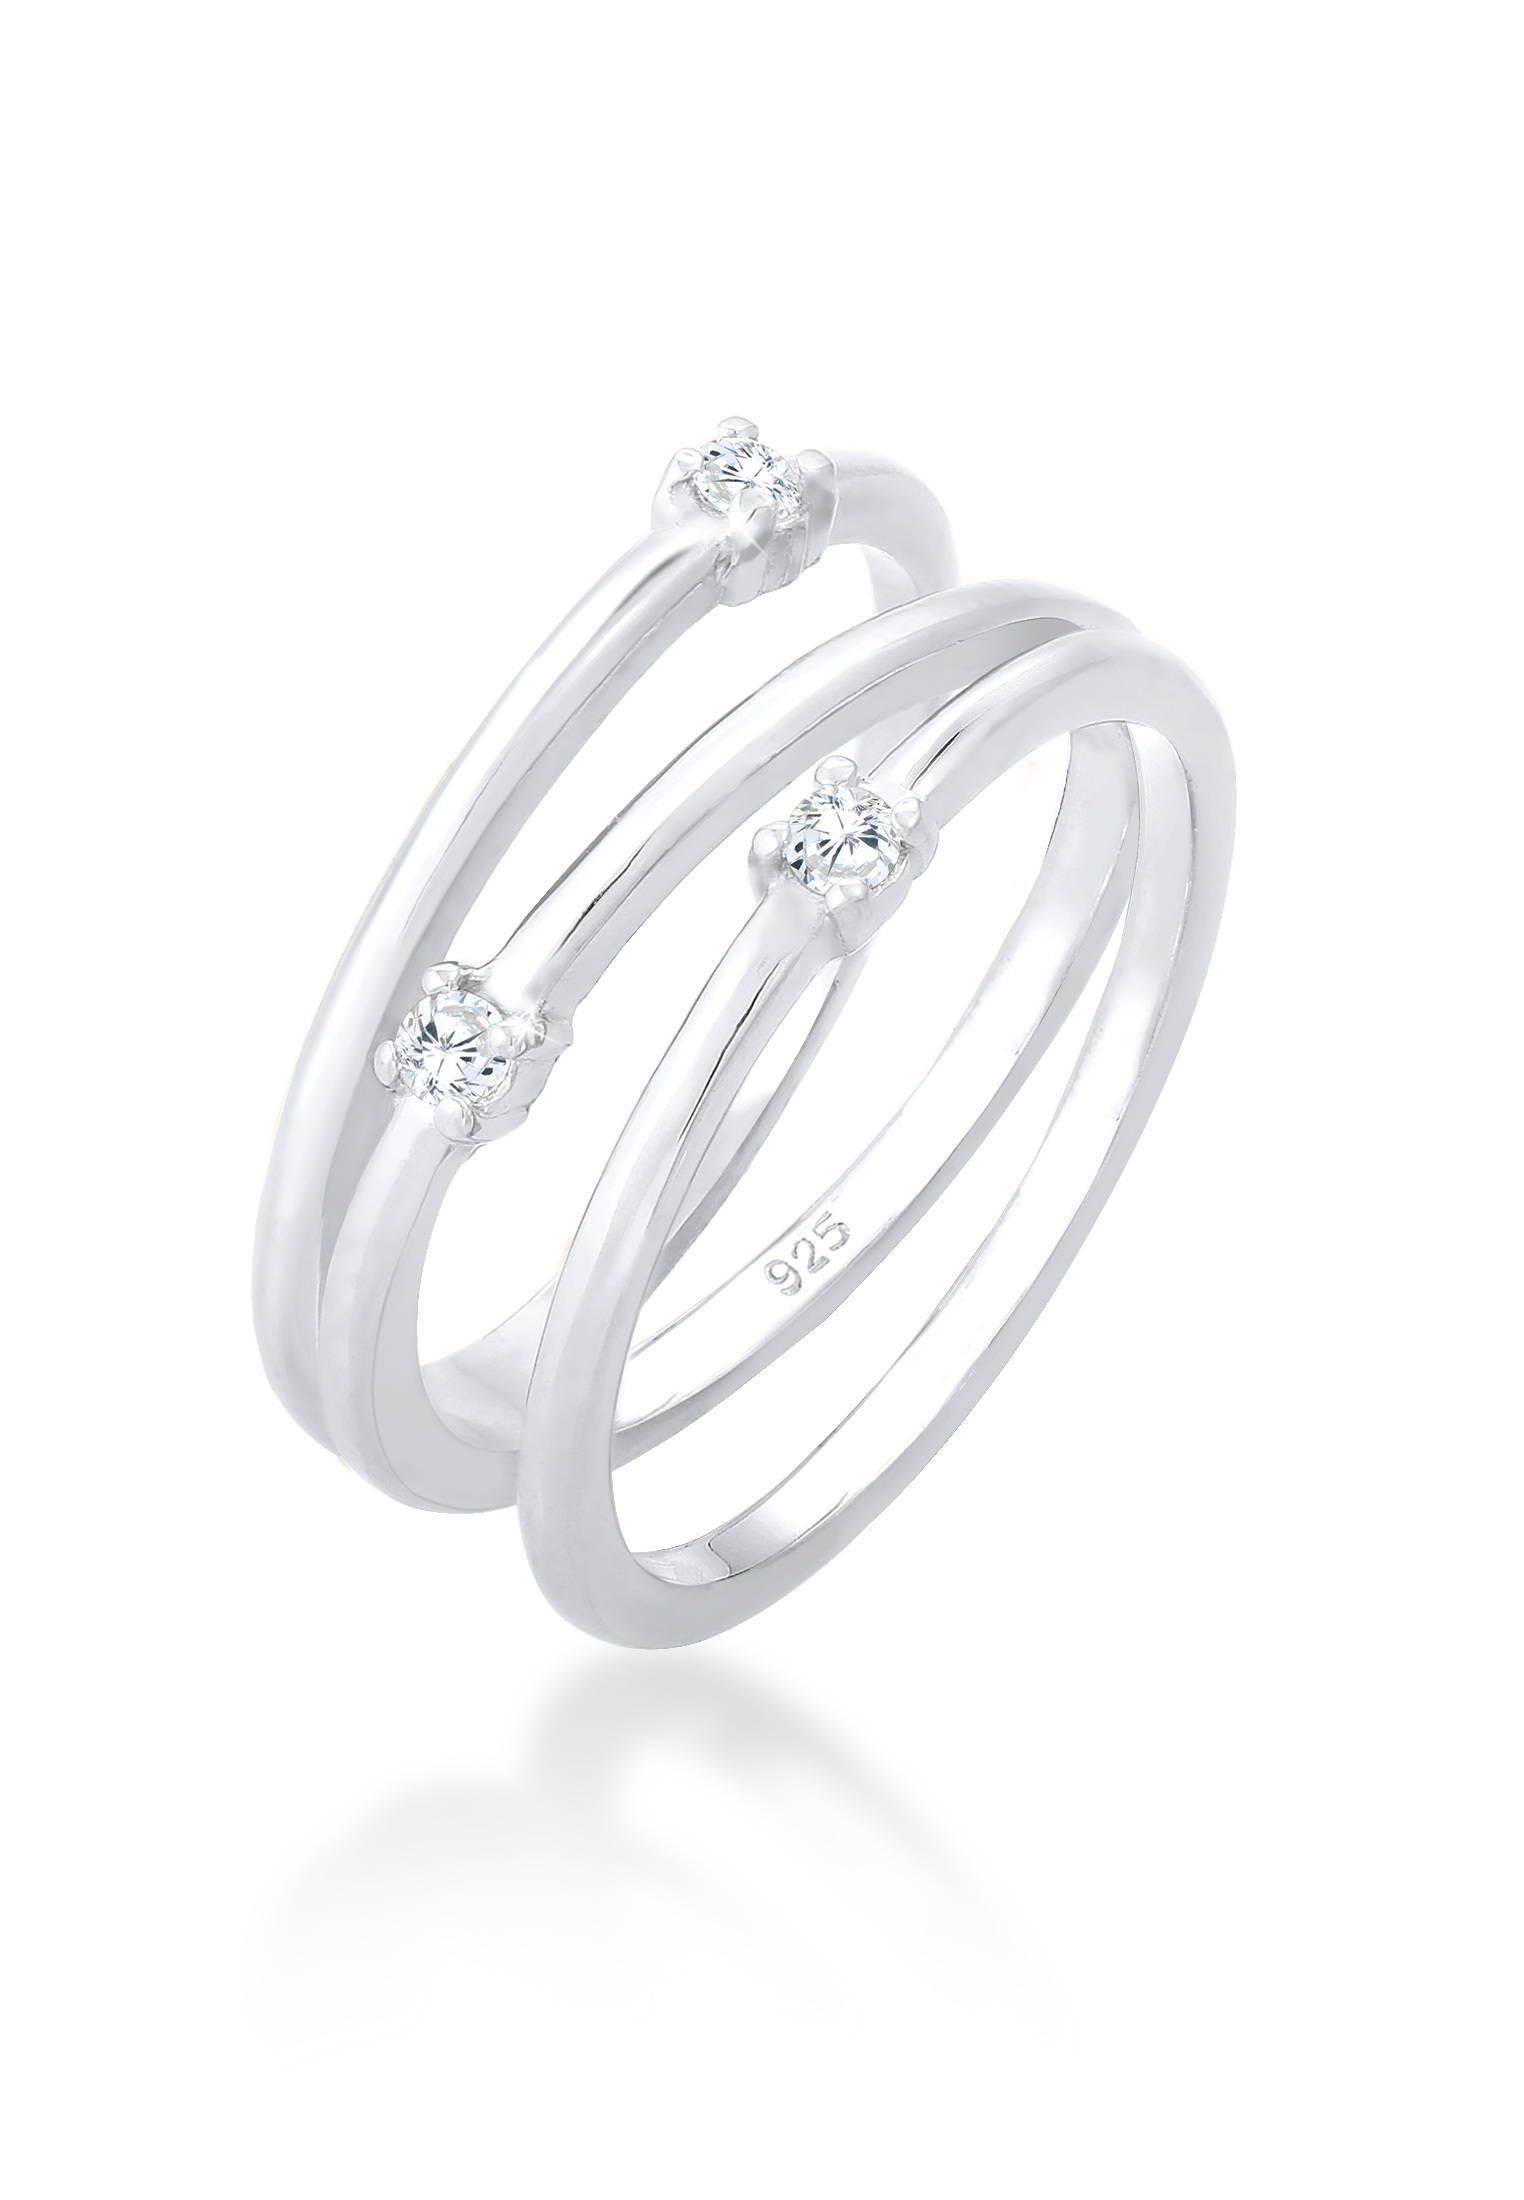 Ring Spirale | Zirkonia ( Weiß ) | 925er Sterling Silber